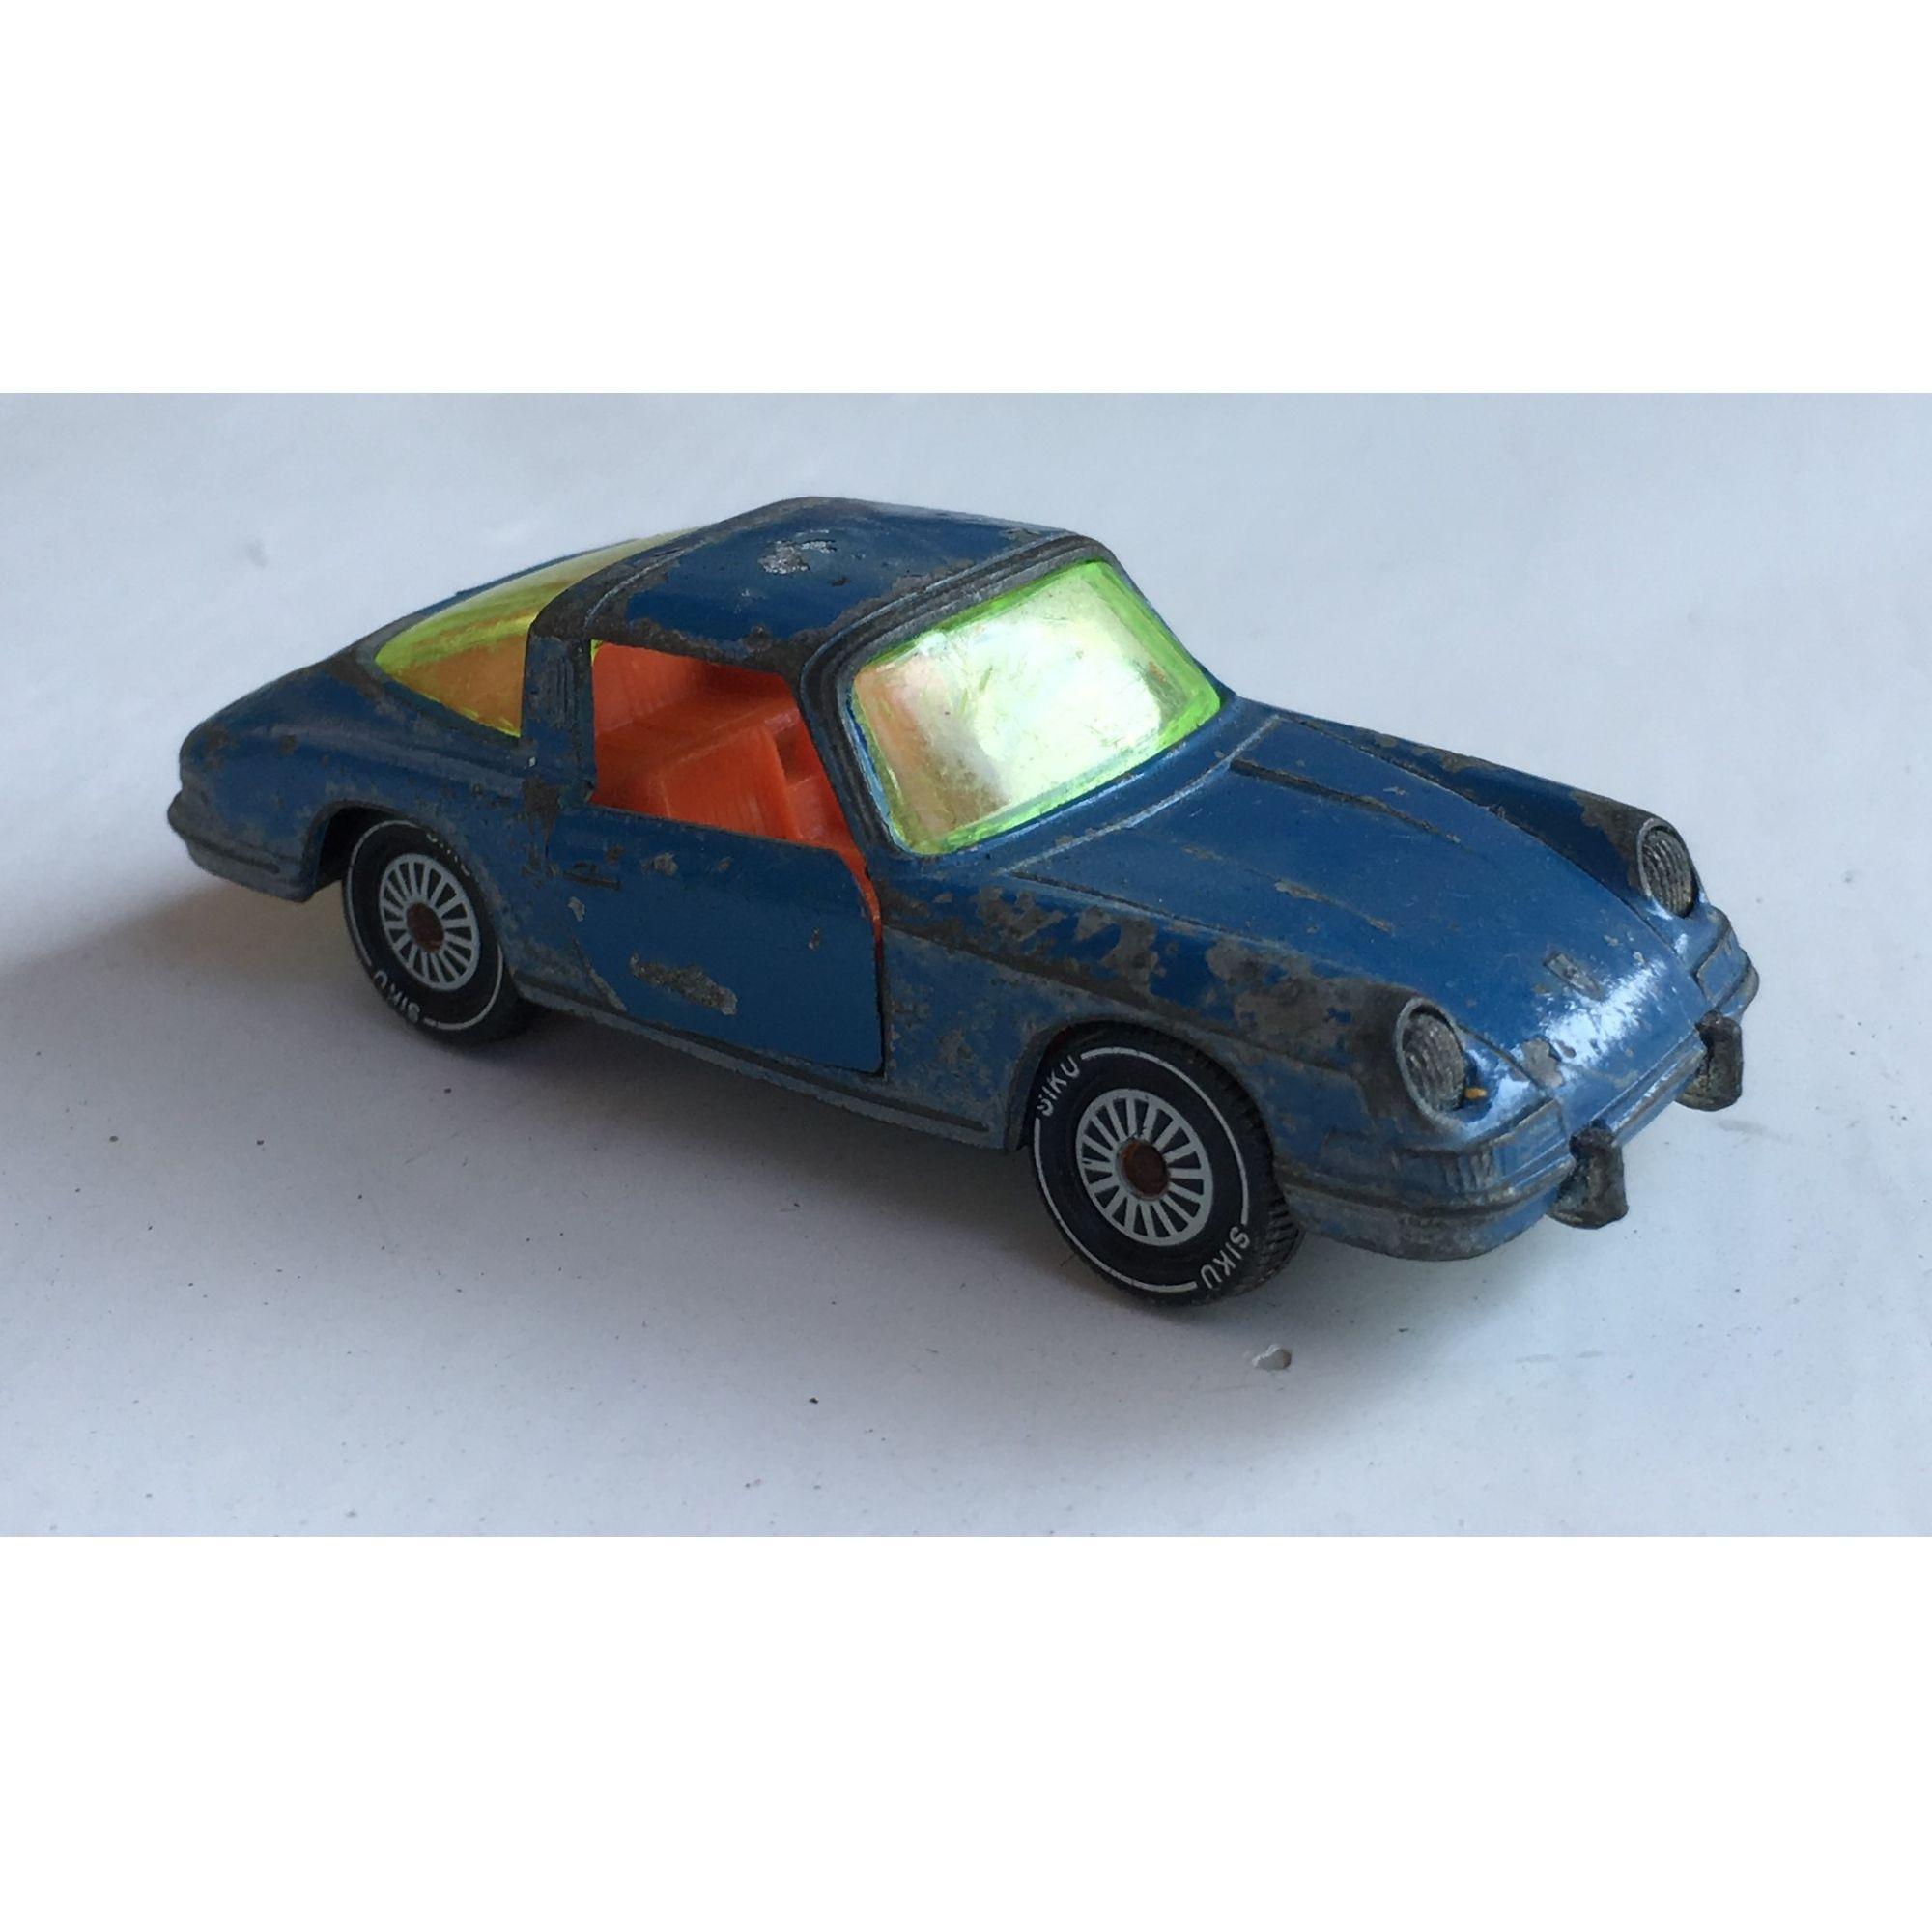 Carrinho Miniatura Antiga Siku Porsche